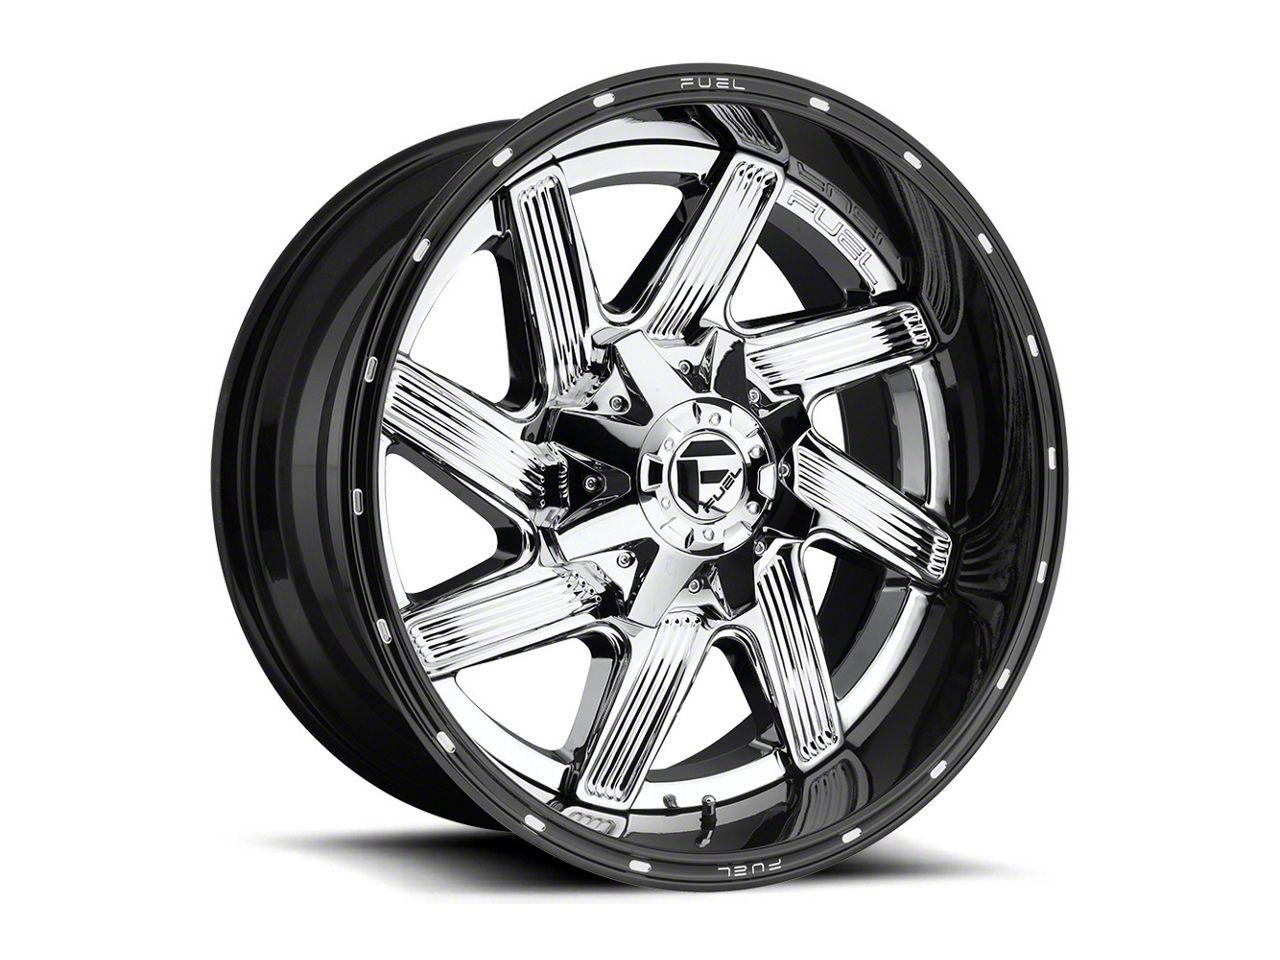 Fuel Wheels Moab Chrome Wheel - 20x12 (87-06 Jeep Wrangler YJ & TJ)